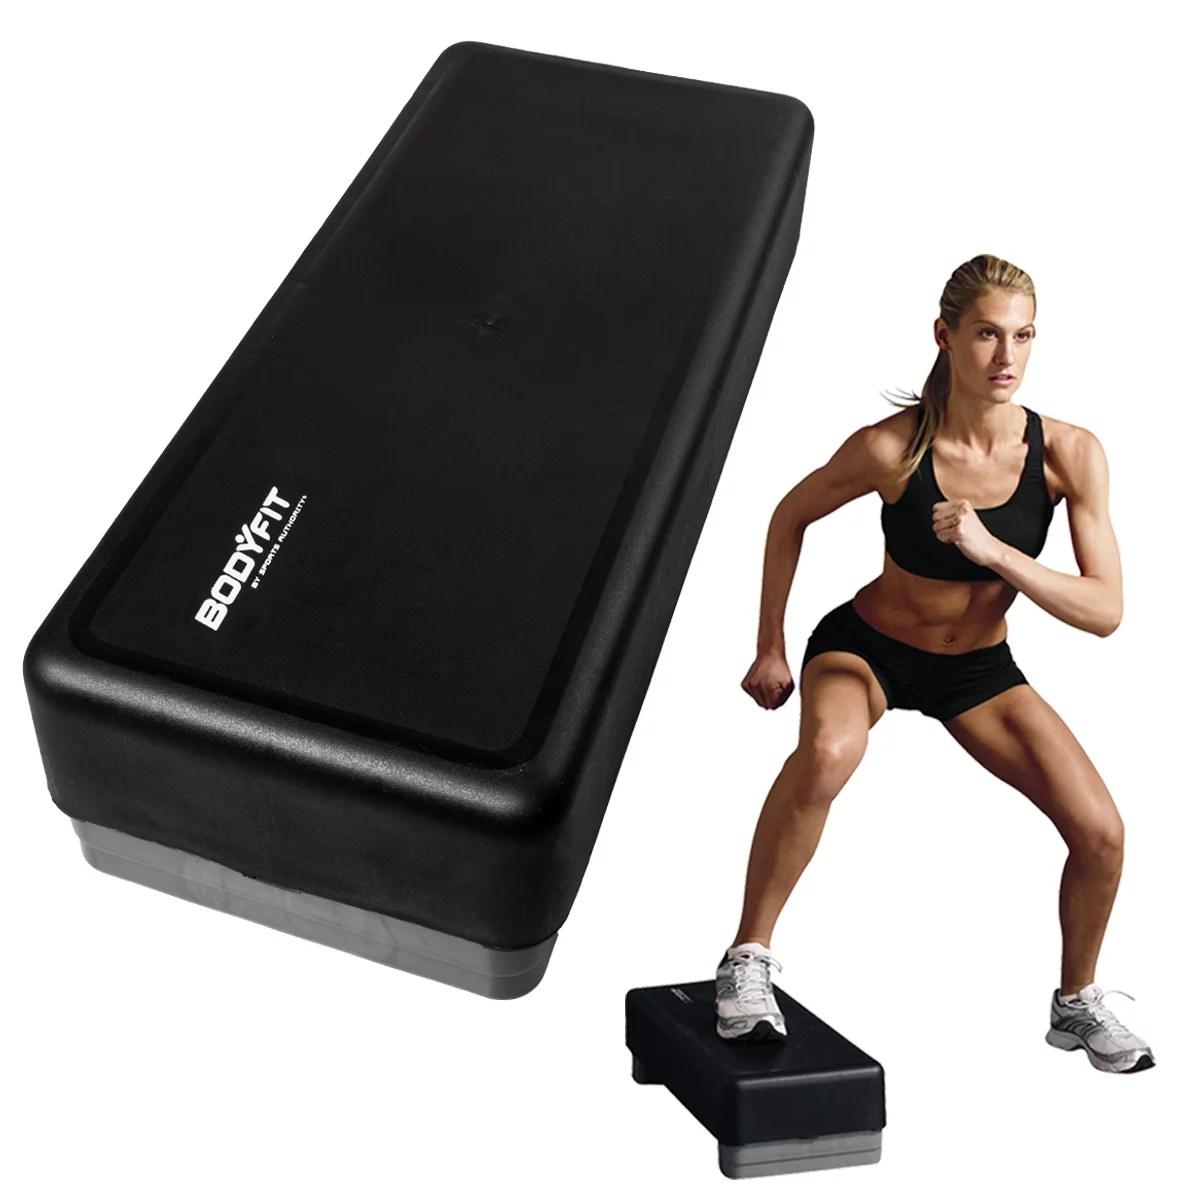 Sports Authority BodyFit Aerobic Fitness Step Platform ...